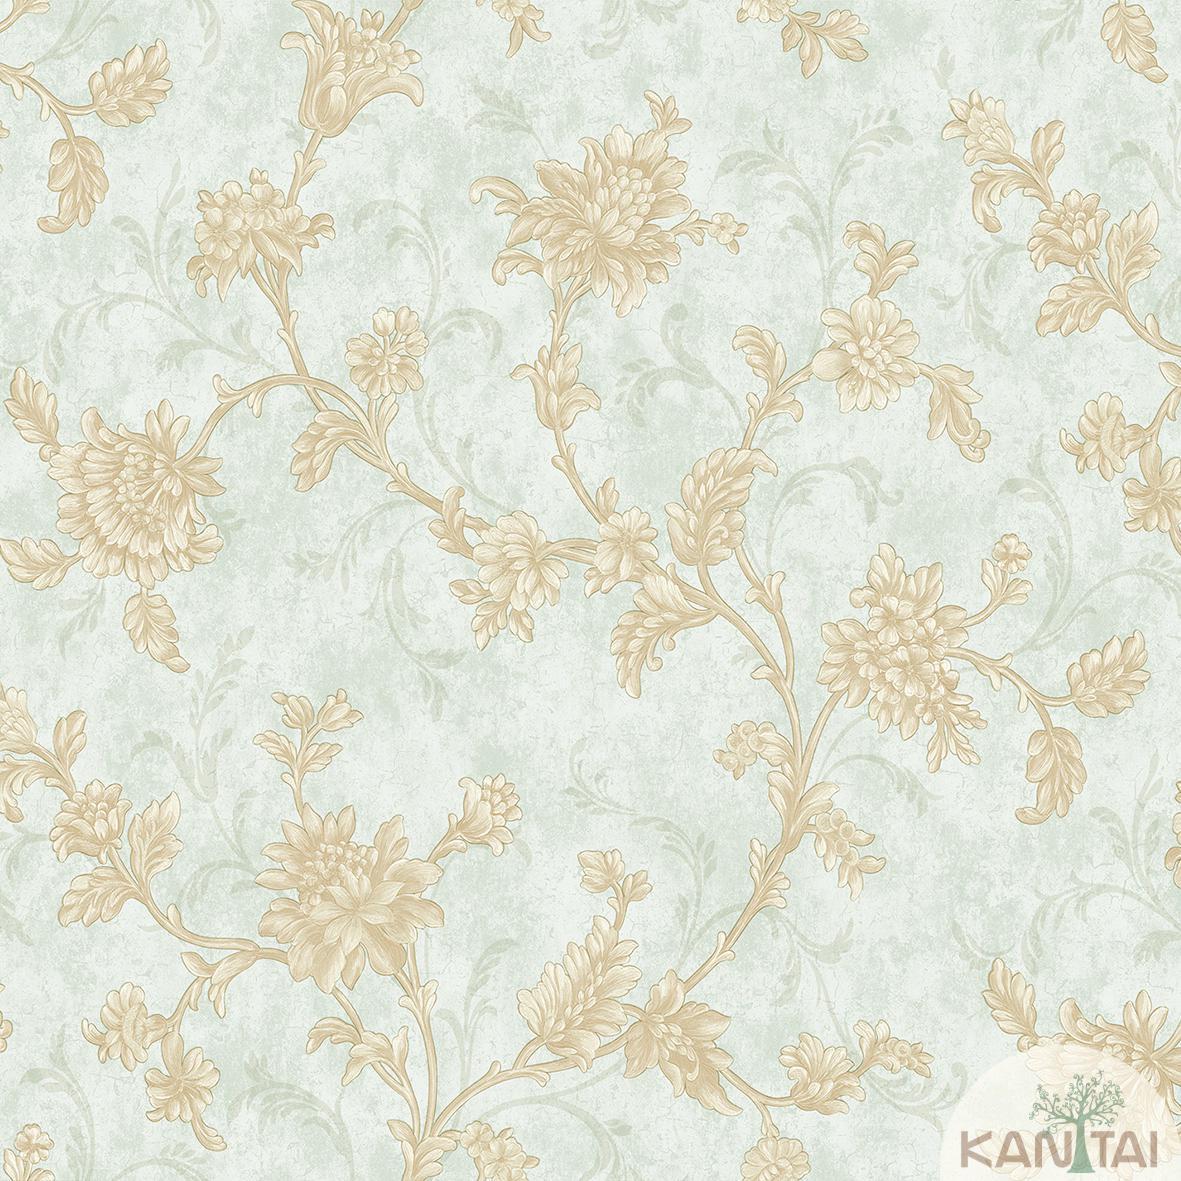 Papel de Parede Kan Tai Non Woven Coleção Flora 2 Baixo relevo Arabesco Floral tons verde, Dourado